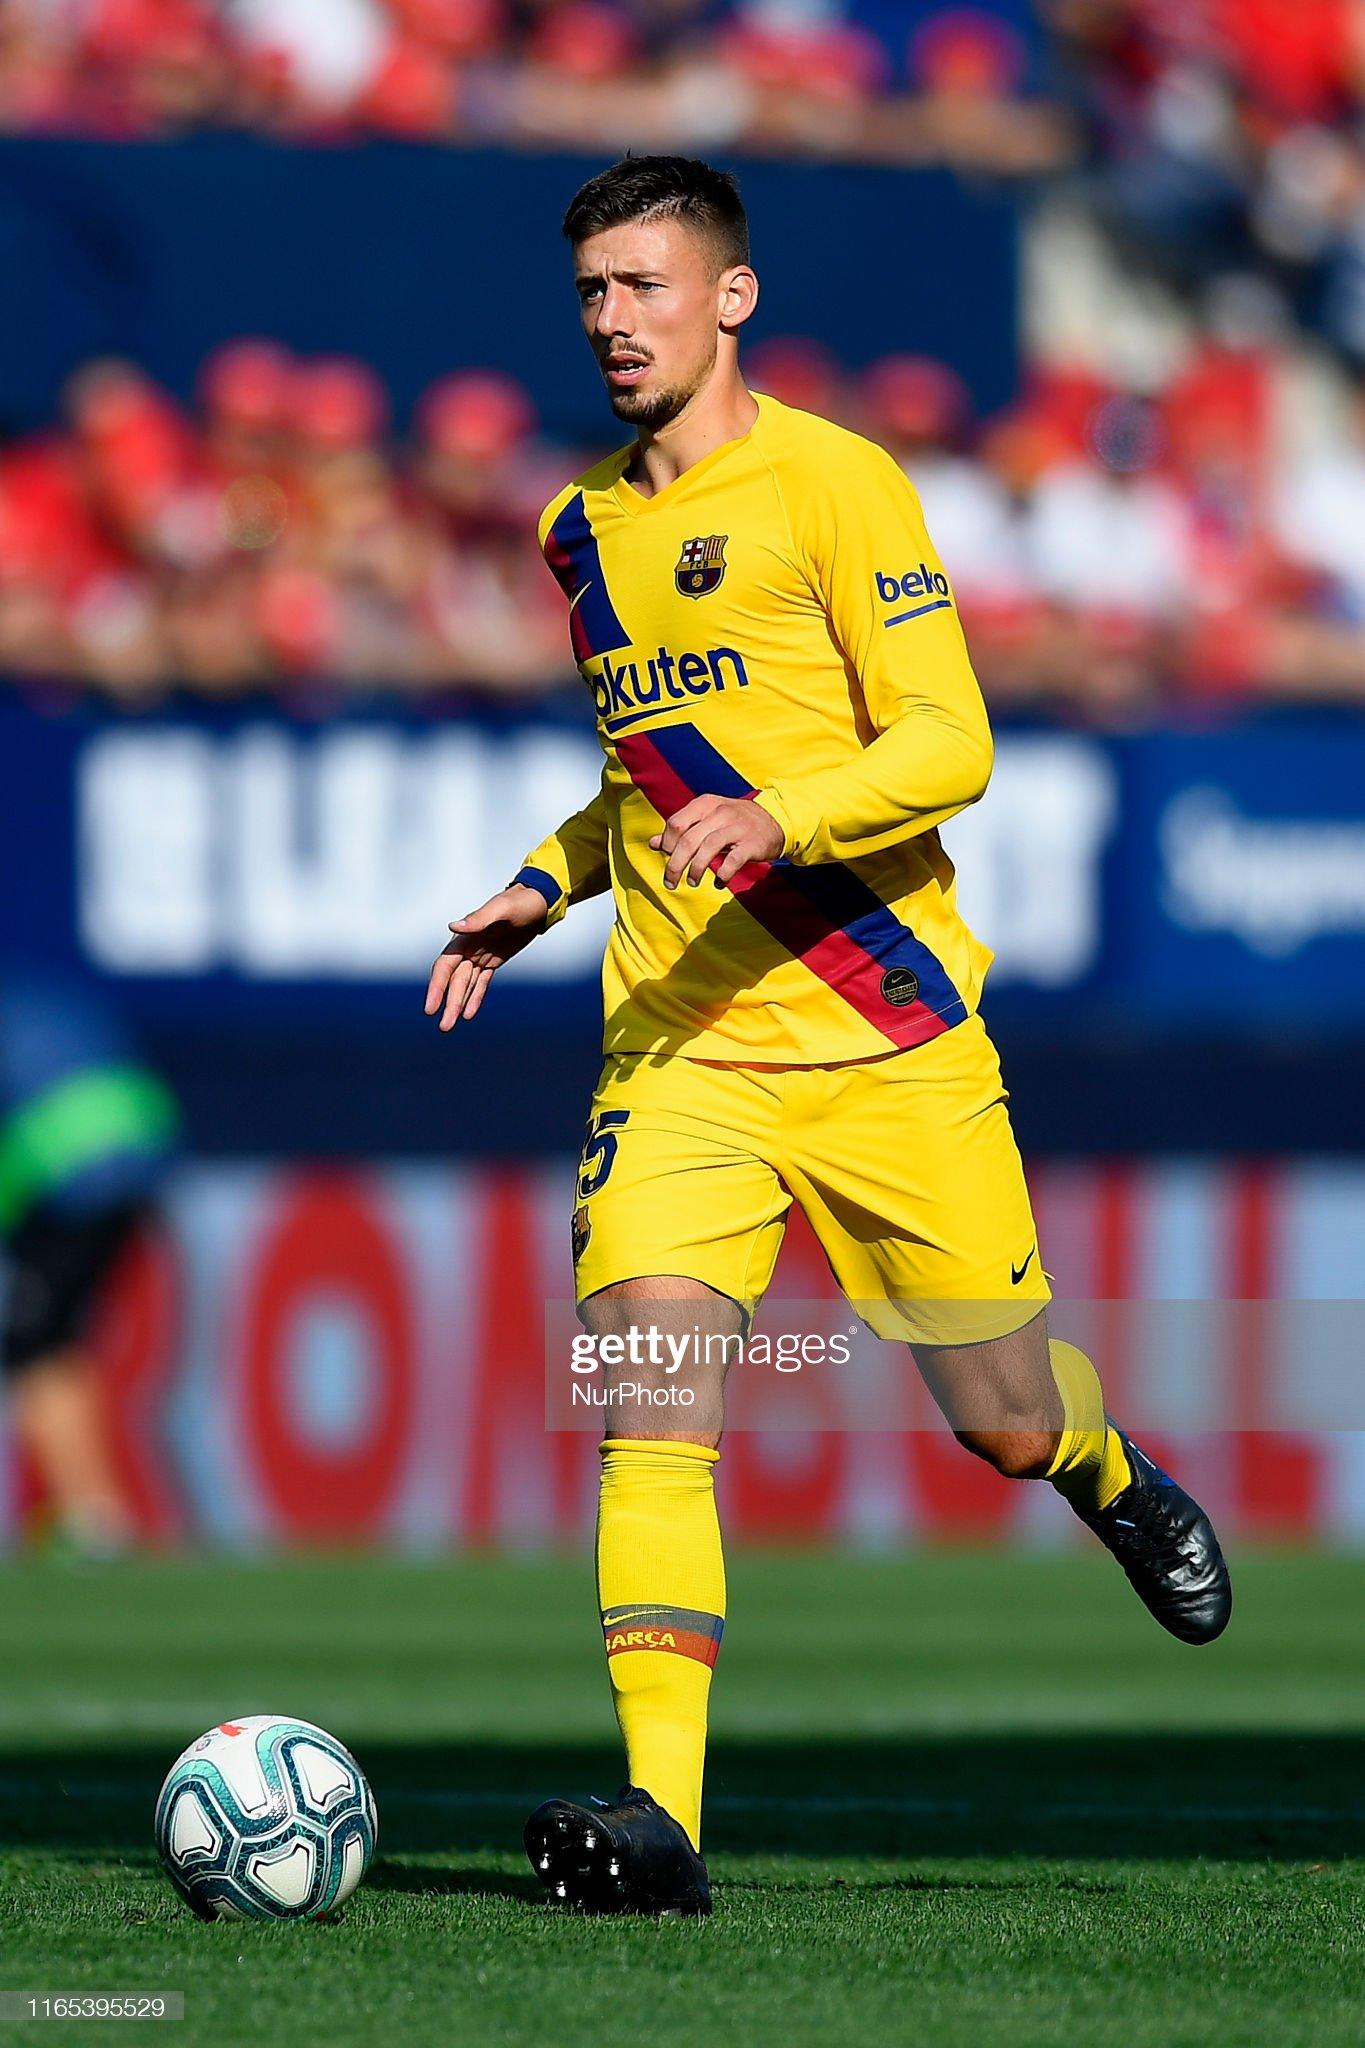 صور مباراة : أوساسونا - برشلونة 2-2 ( 31-08-2019 )  Clement-lenglet-of-barcelona-in-action-during-the-liga-match-between-picture-id1165395529?s=2048x2048